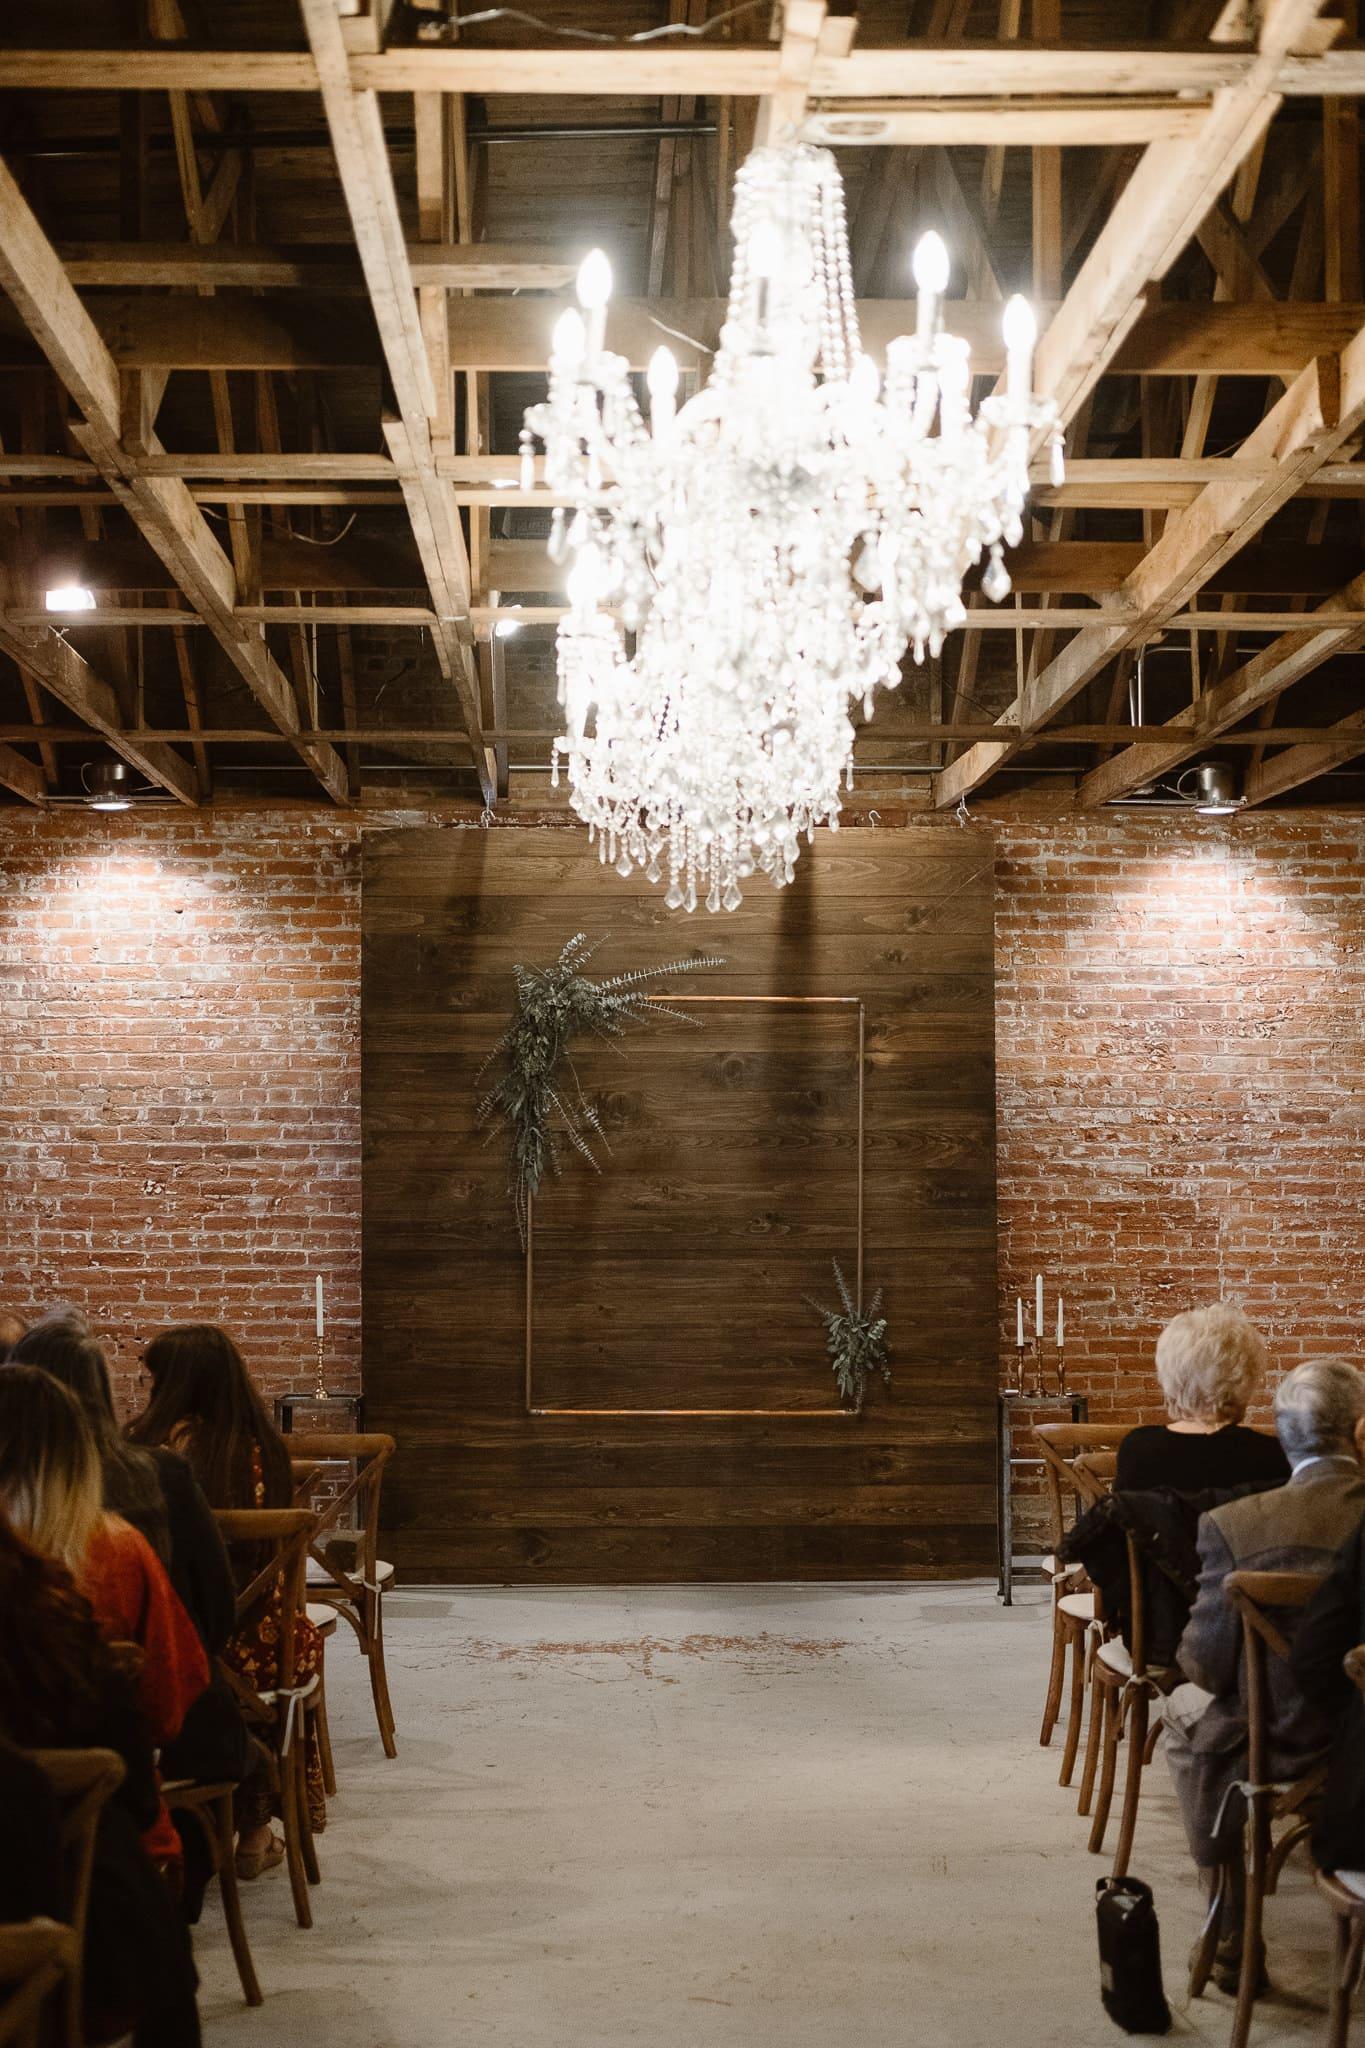 St Vrain Wedding Photographer | Longmont Wedding Photographer | Colorado Winter Wedding Photographer, Colorado industrial chic wedding ceremony